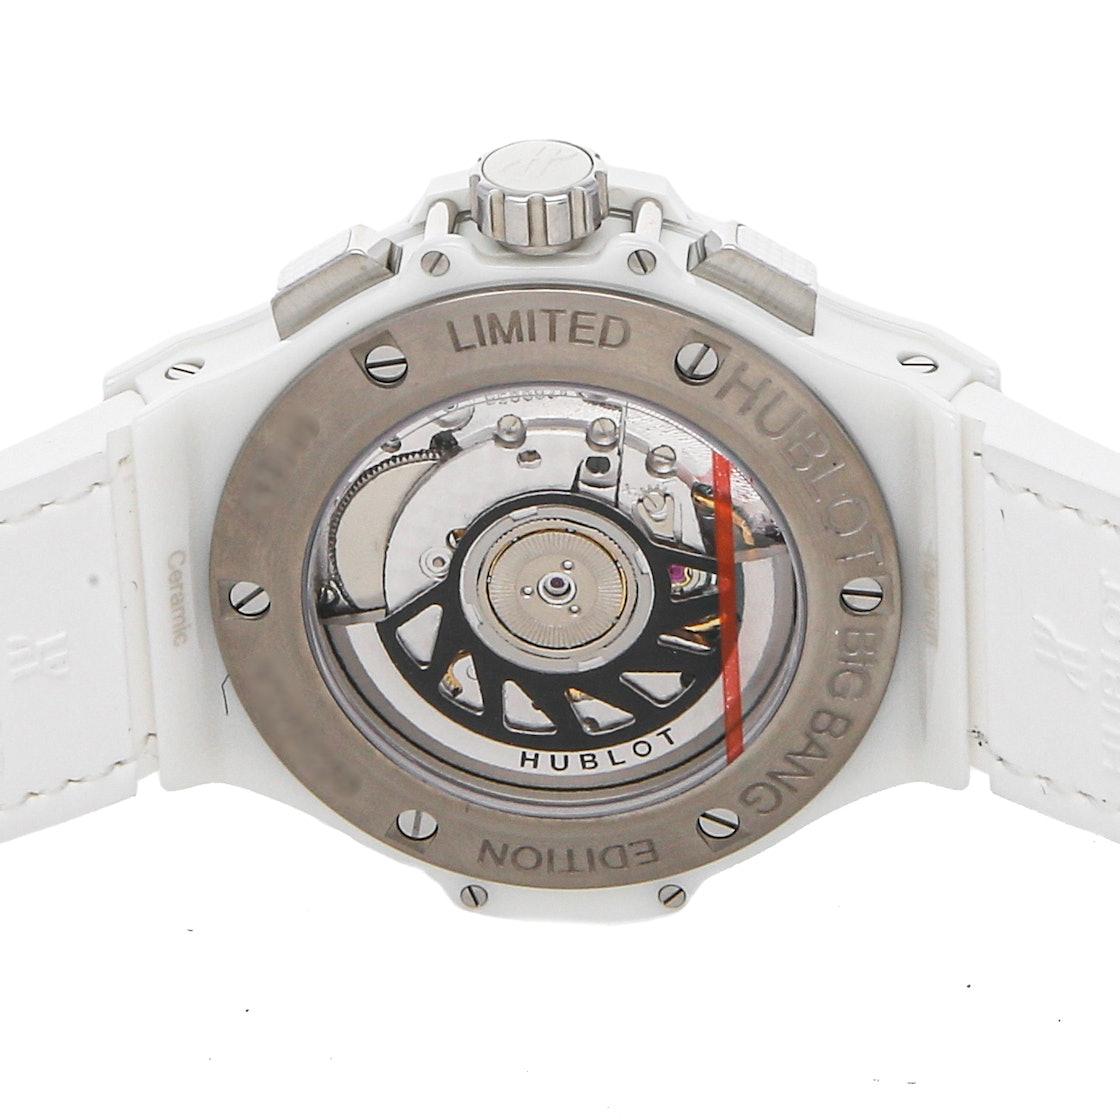 Hublot Big Bang Tutti Frutti Chronograph 341.HW.7517.VR.1975